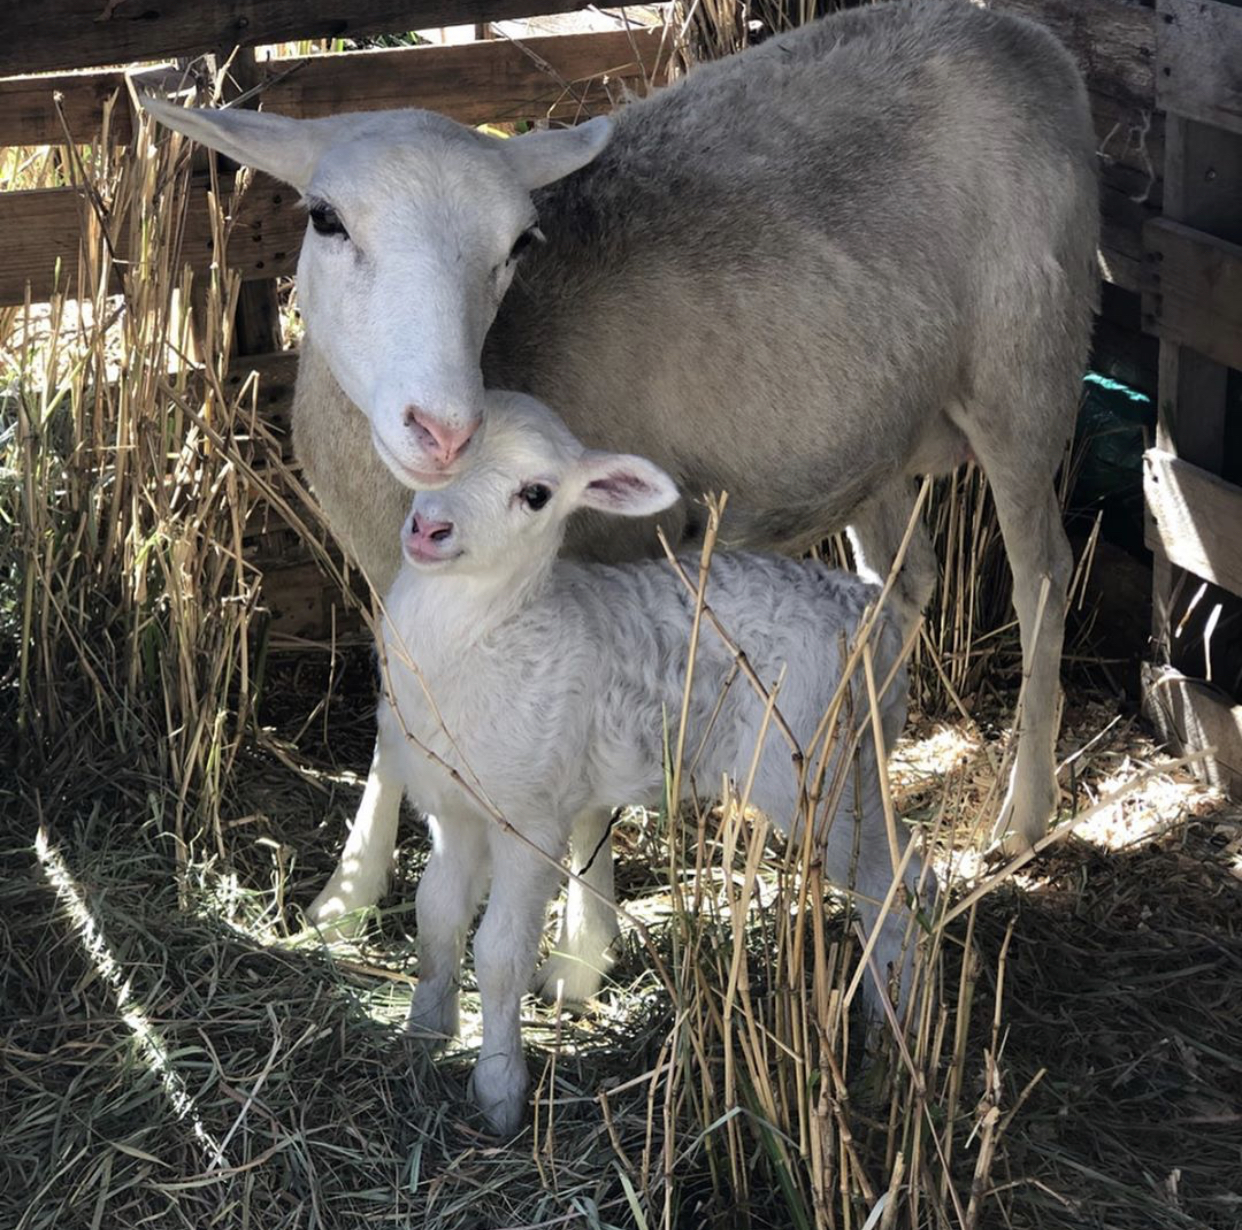 Debbie Hairy & her baby, Bella